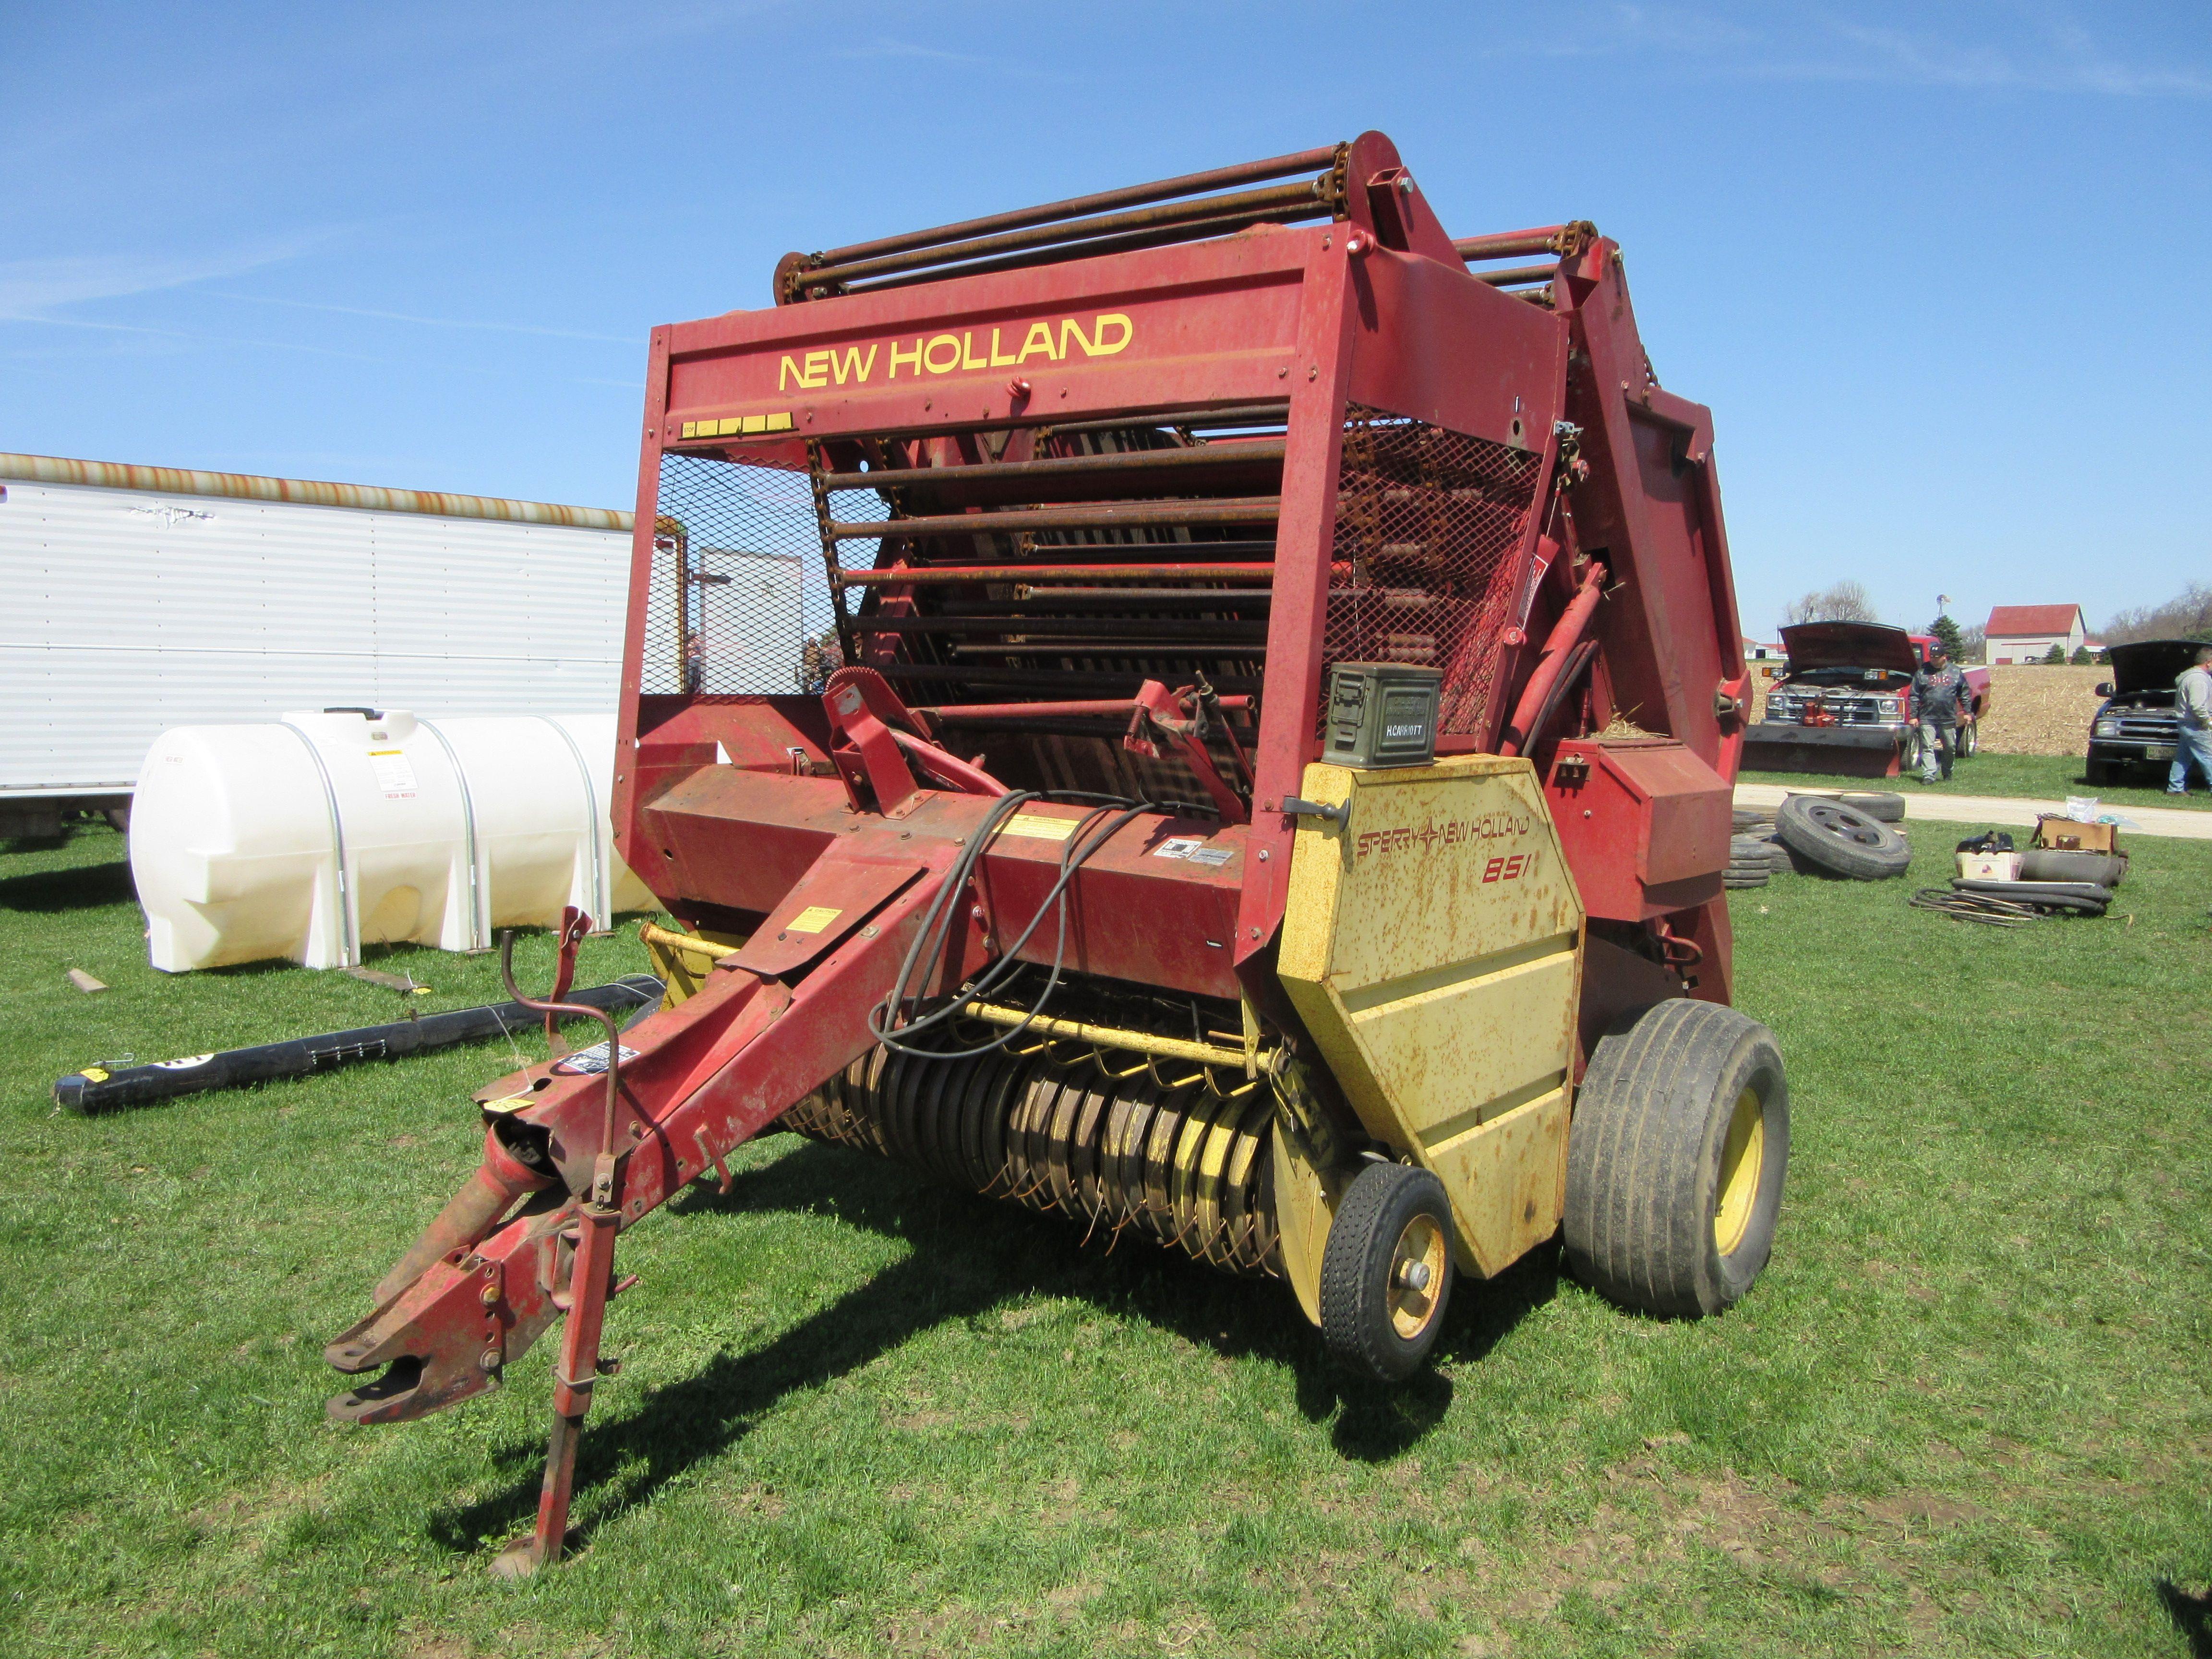 New Holland 851 round baler | New Holland farm equipment